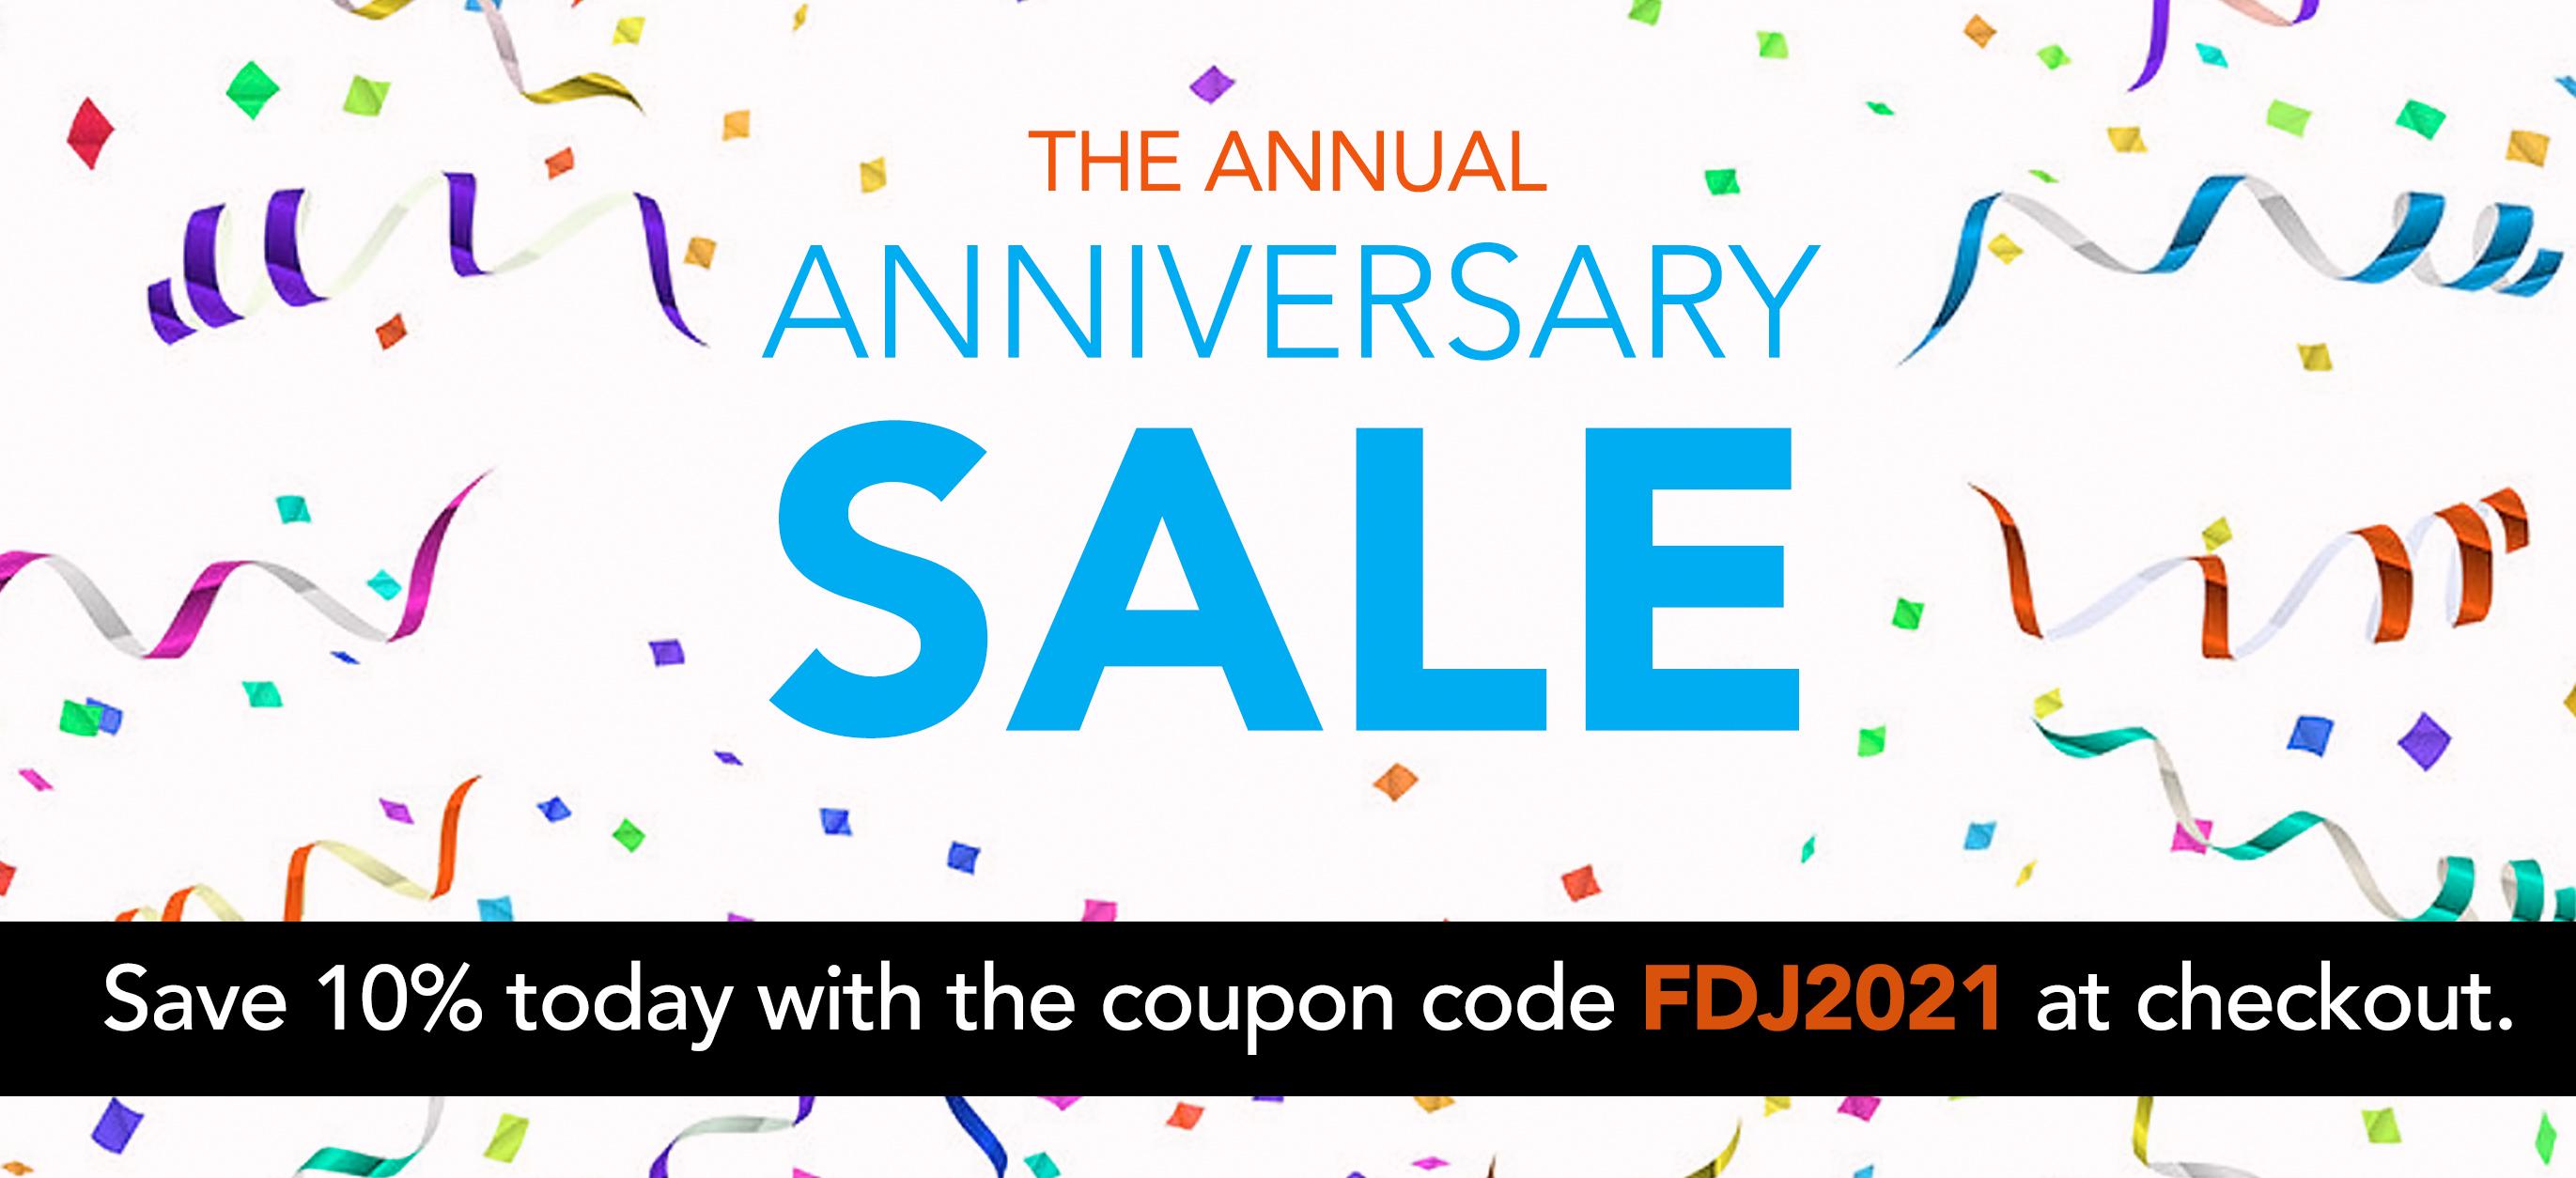 anniversary sale coupon code FDJ2021